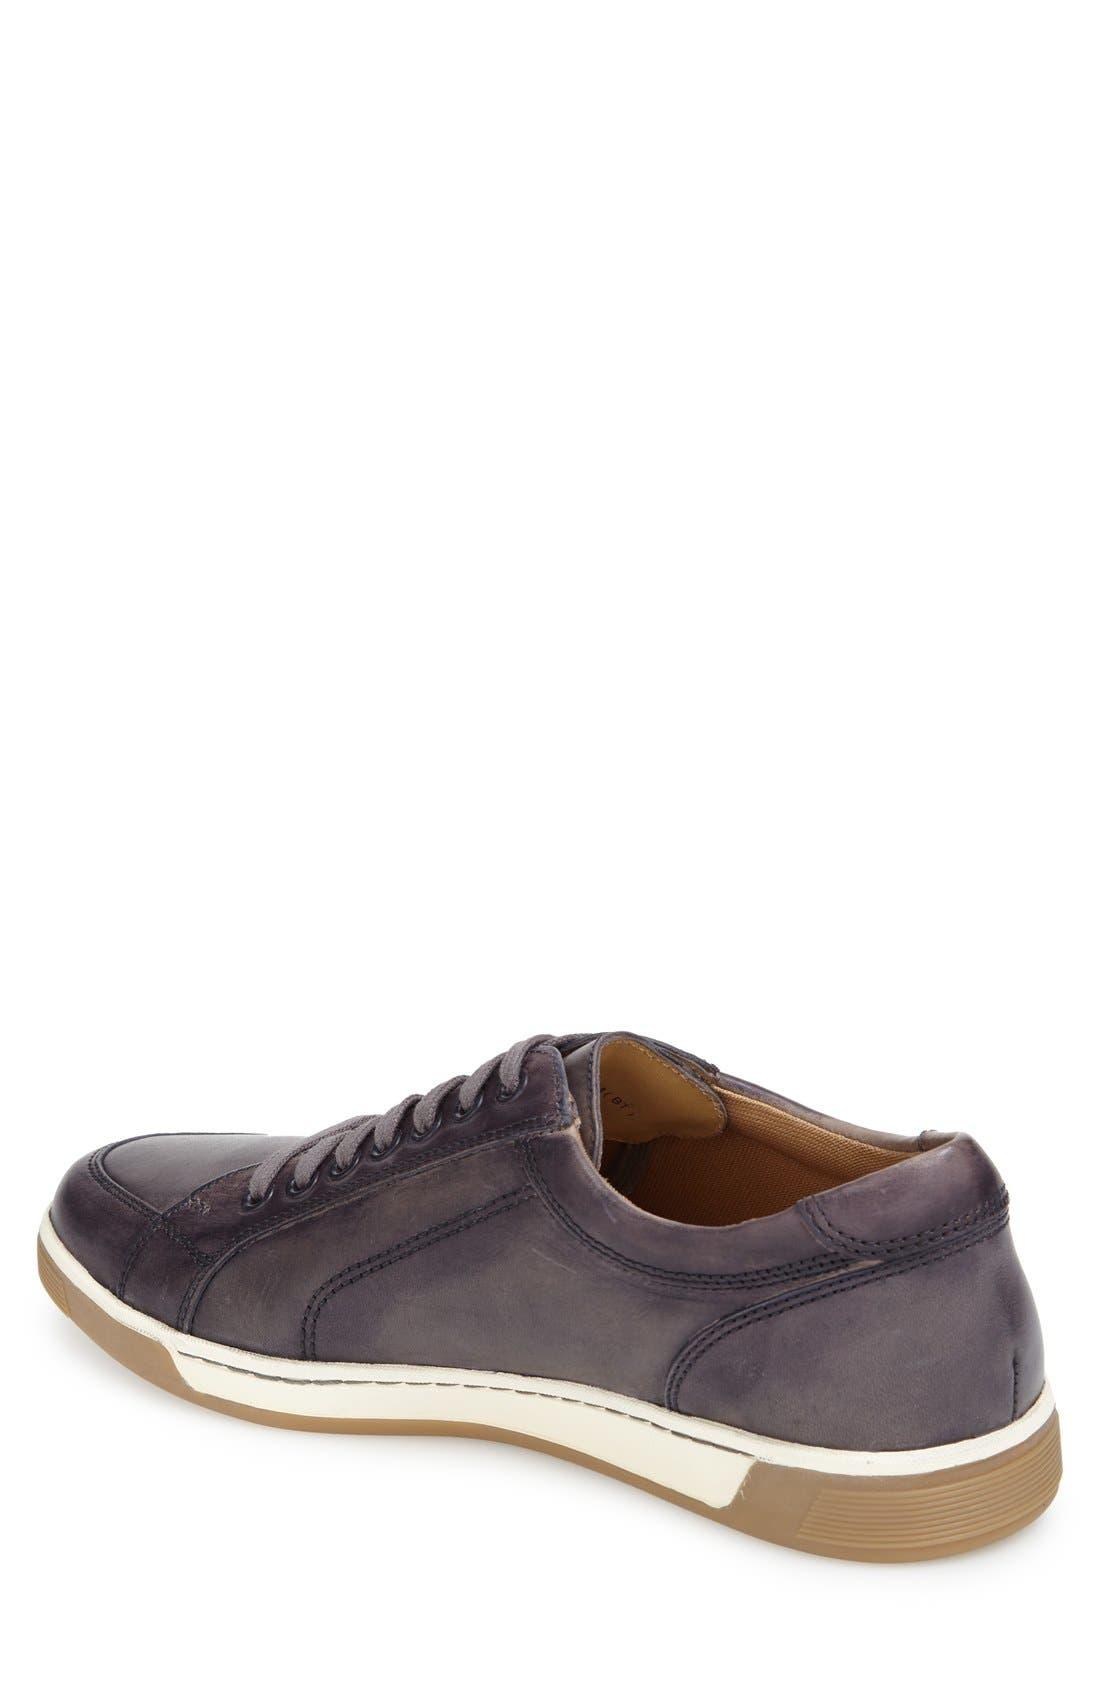 Alternate Image 2  - Cole Haan 'Vartan Sport Oxford' Sneaker (Men)